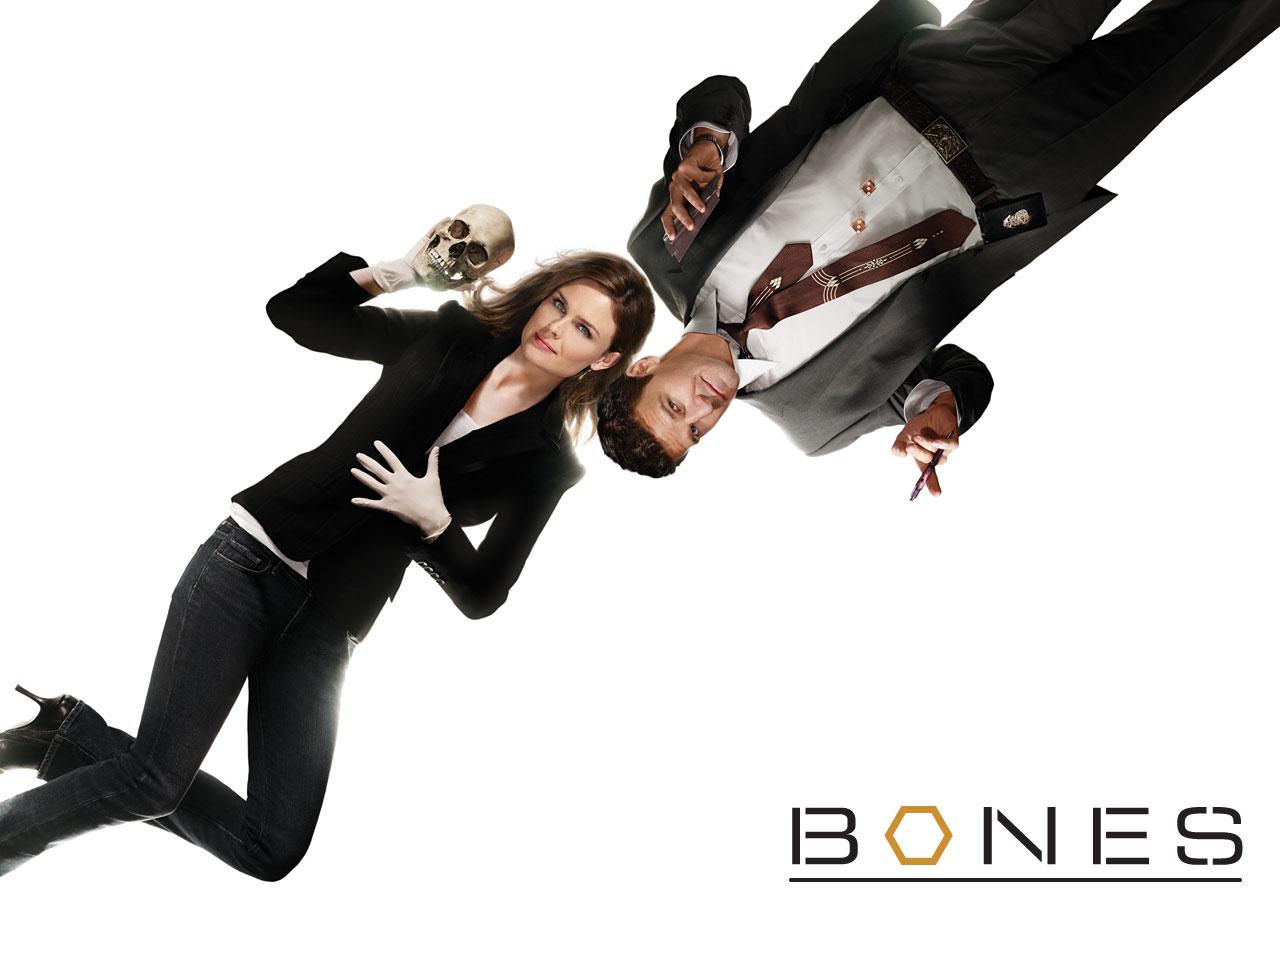 http://1.bp.blogspot.com/_4fB_zmP-o4c/TFHimHChgCI/AAAAAAAAAS8/pWnnY930KjA/s1600/bones.jpg